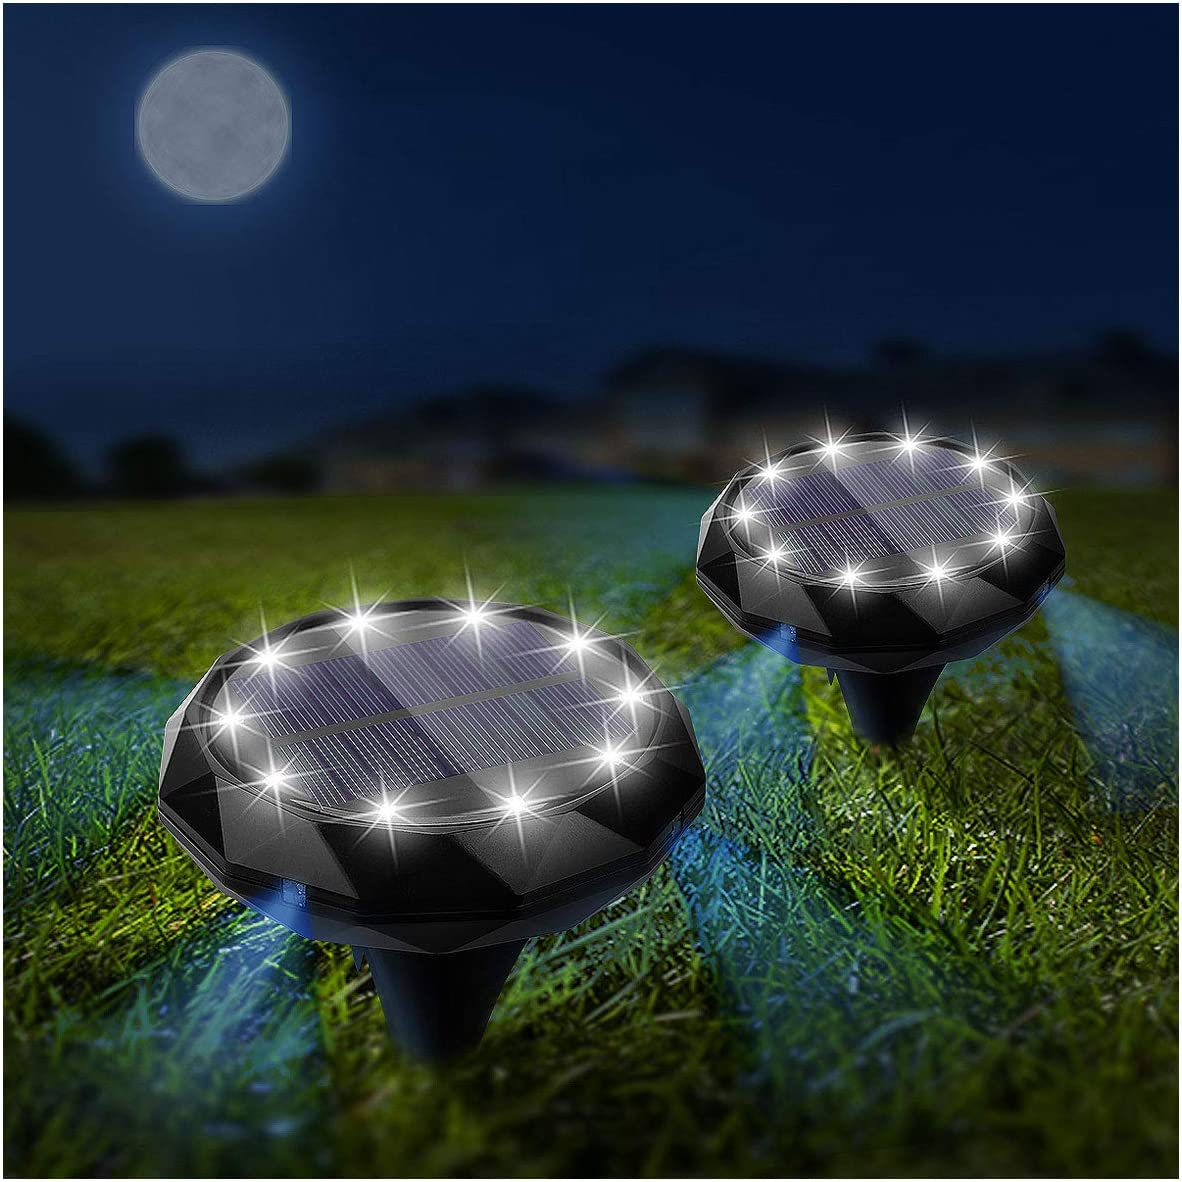 Solar Ground Lights 2 Pack 14 LED Lighting IP45 Waterproof Solar Ground Lights, Solar Disk Lights for Pathway Lawn Patio Yard